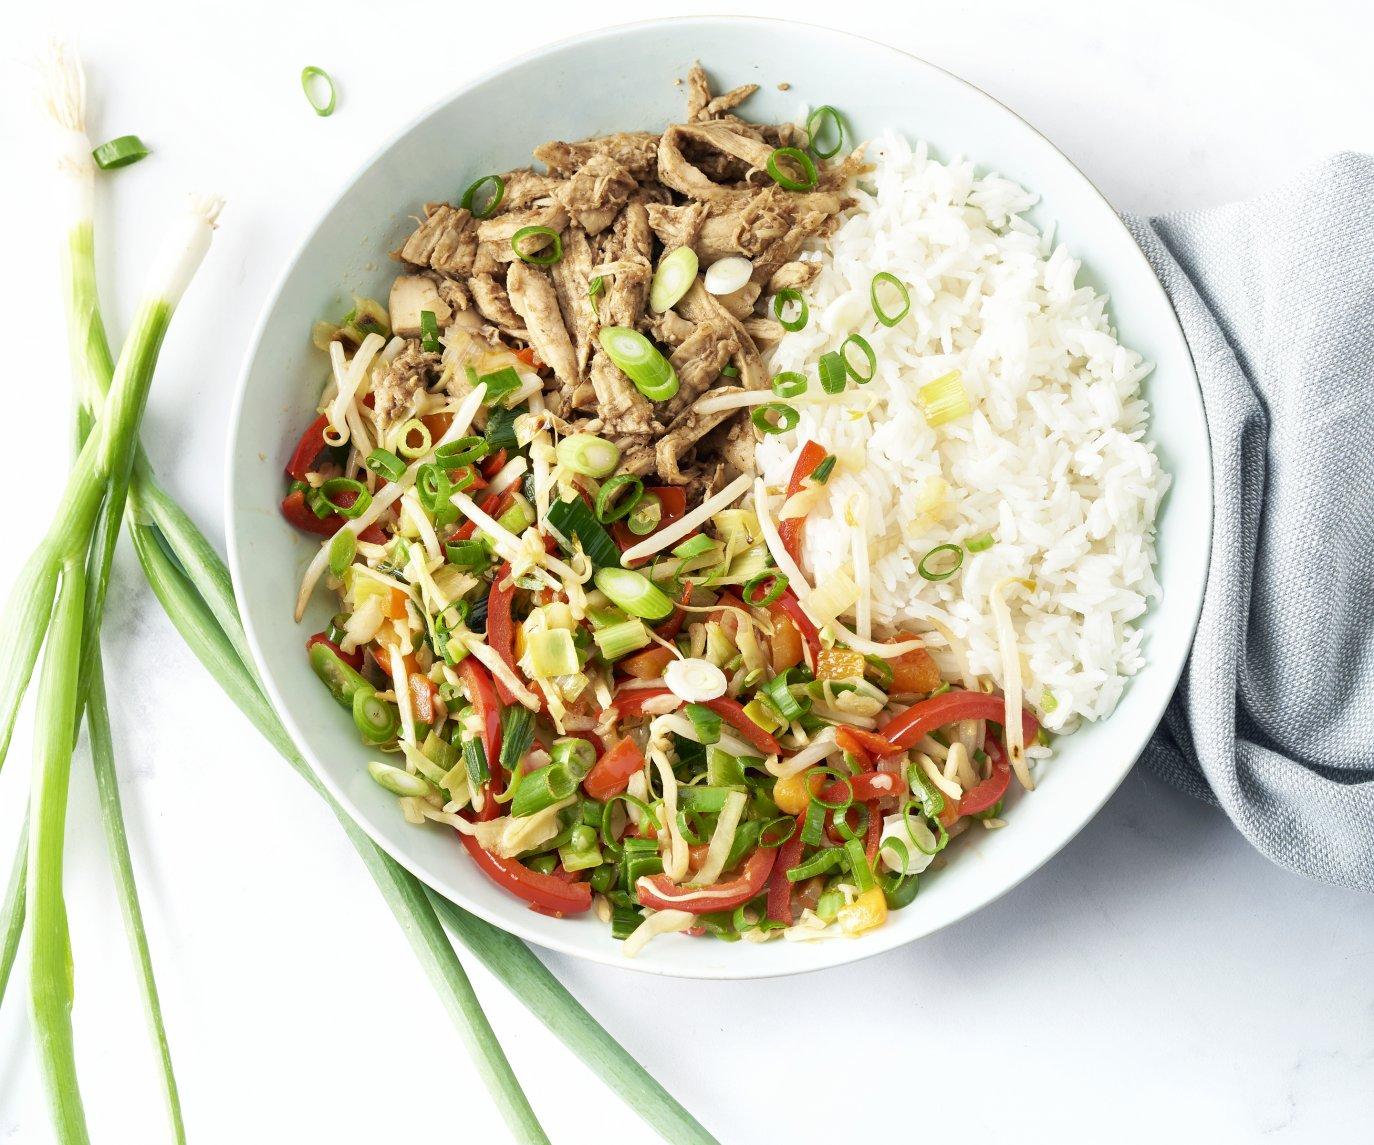 'Sticky' pulled chicken met wokgroenten en rijst